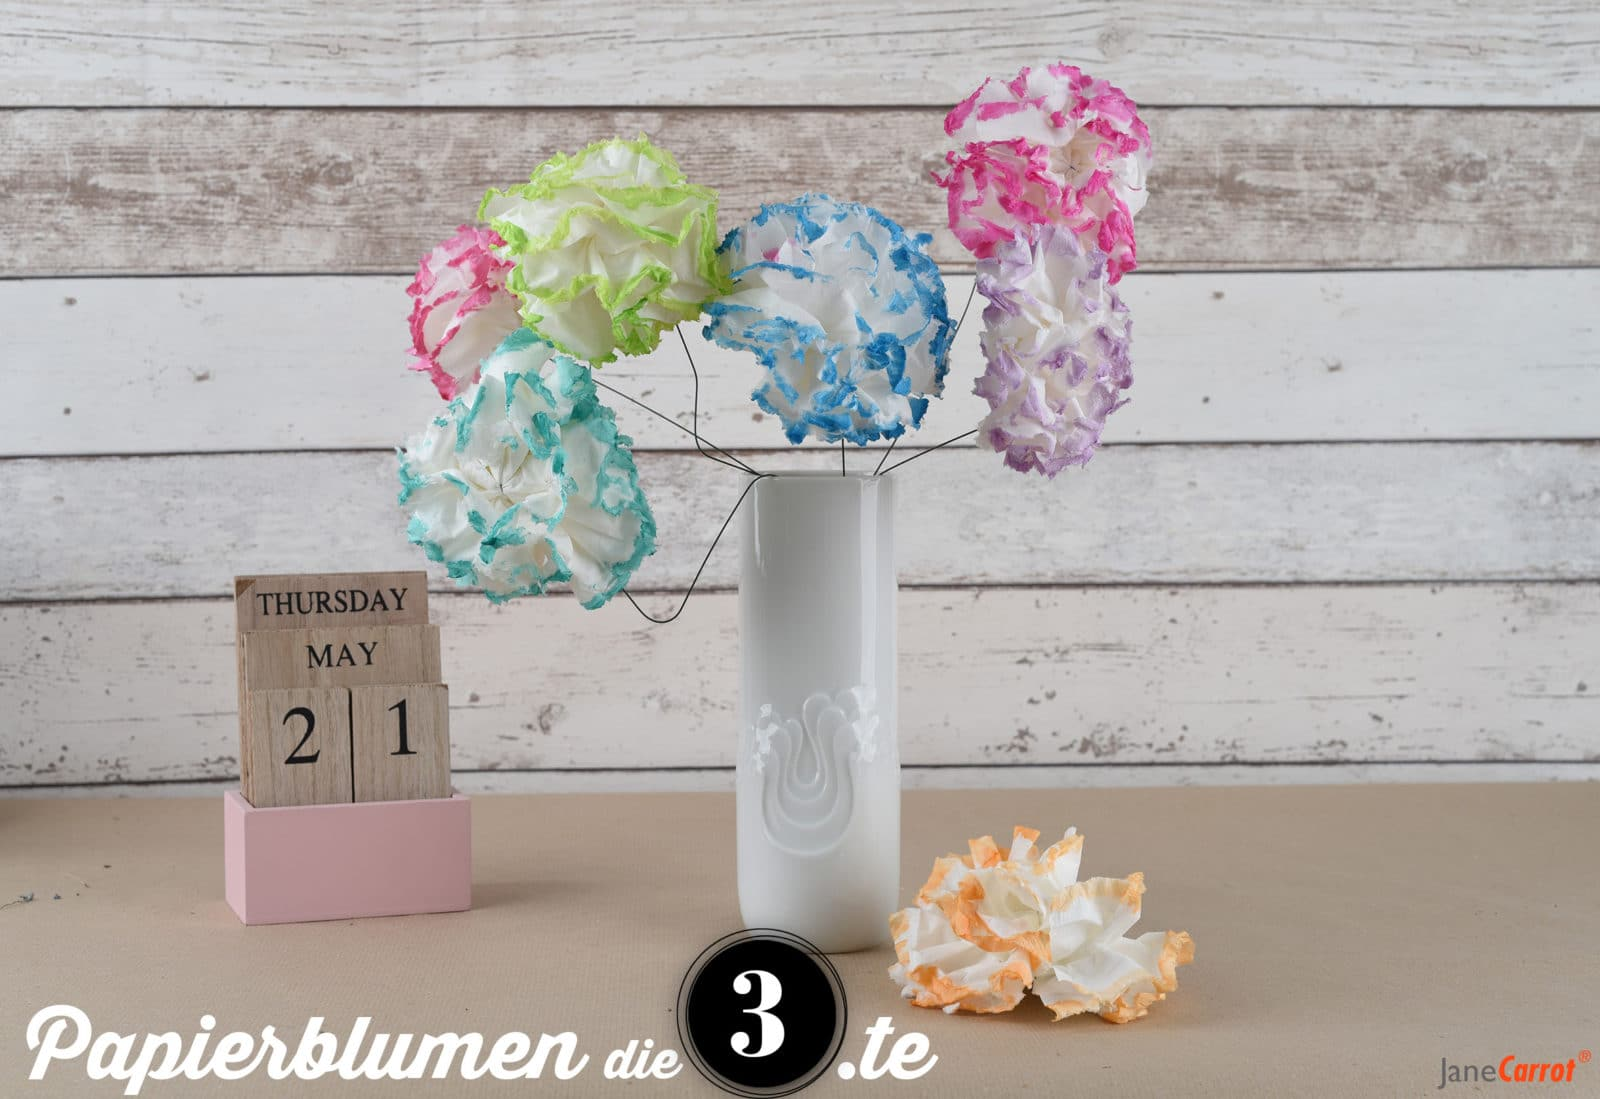 papierblumen aus tempos ja heisst ja papier taschent cher handmade kultur. Black Bedroom Furniture Sets. Home Design Ideas